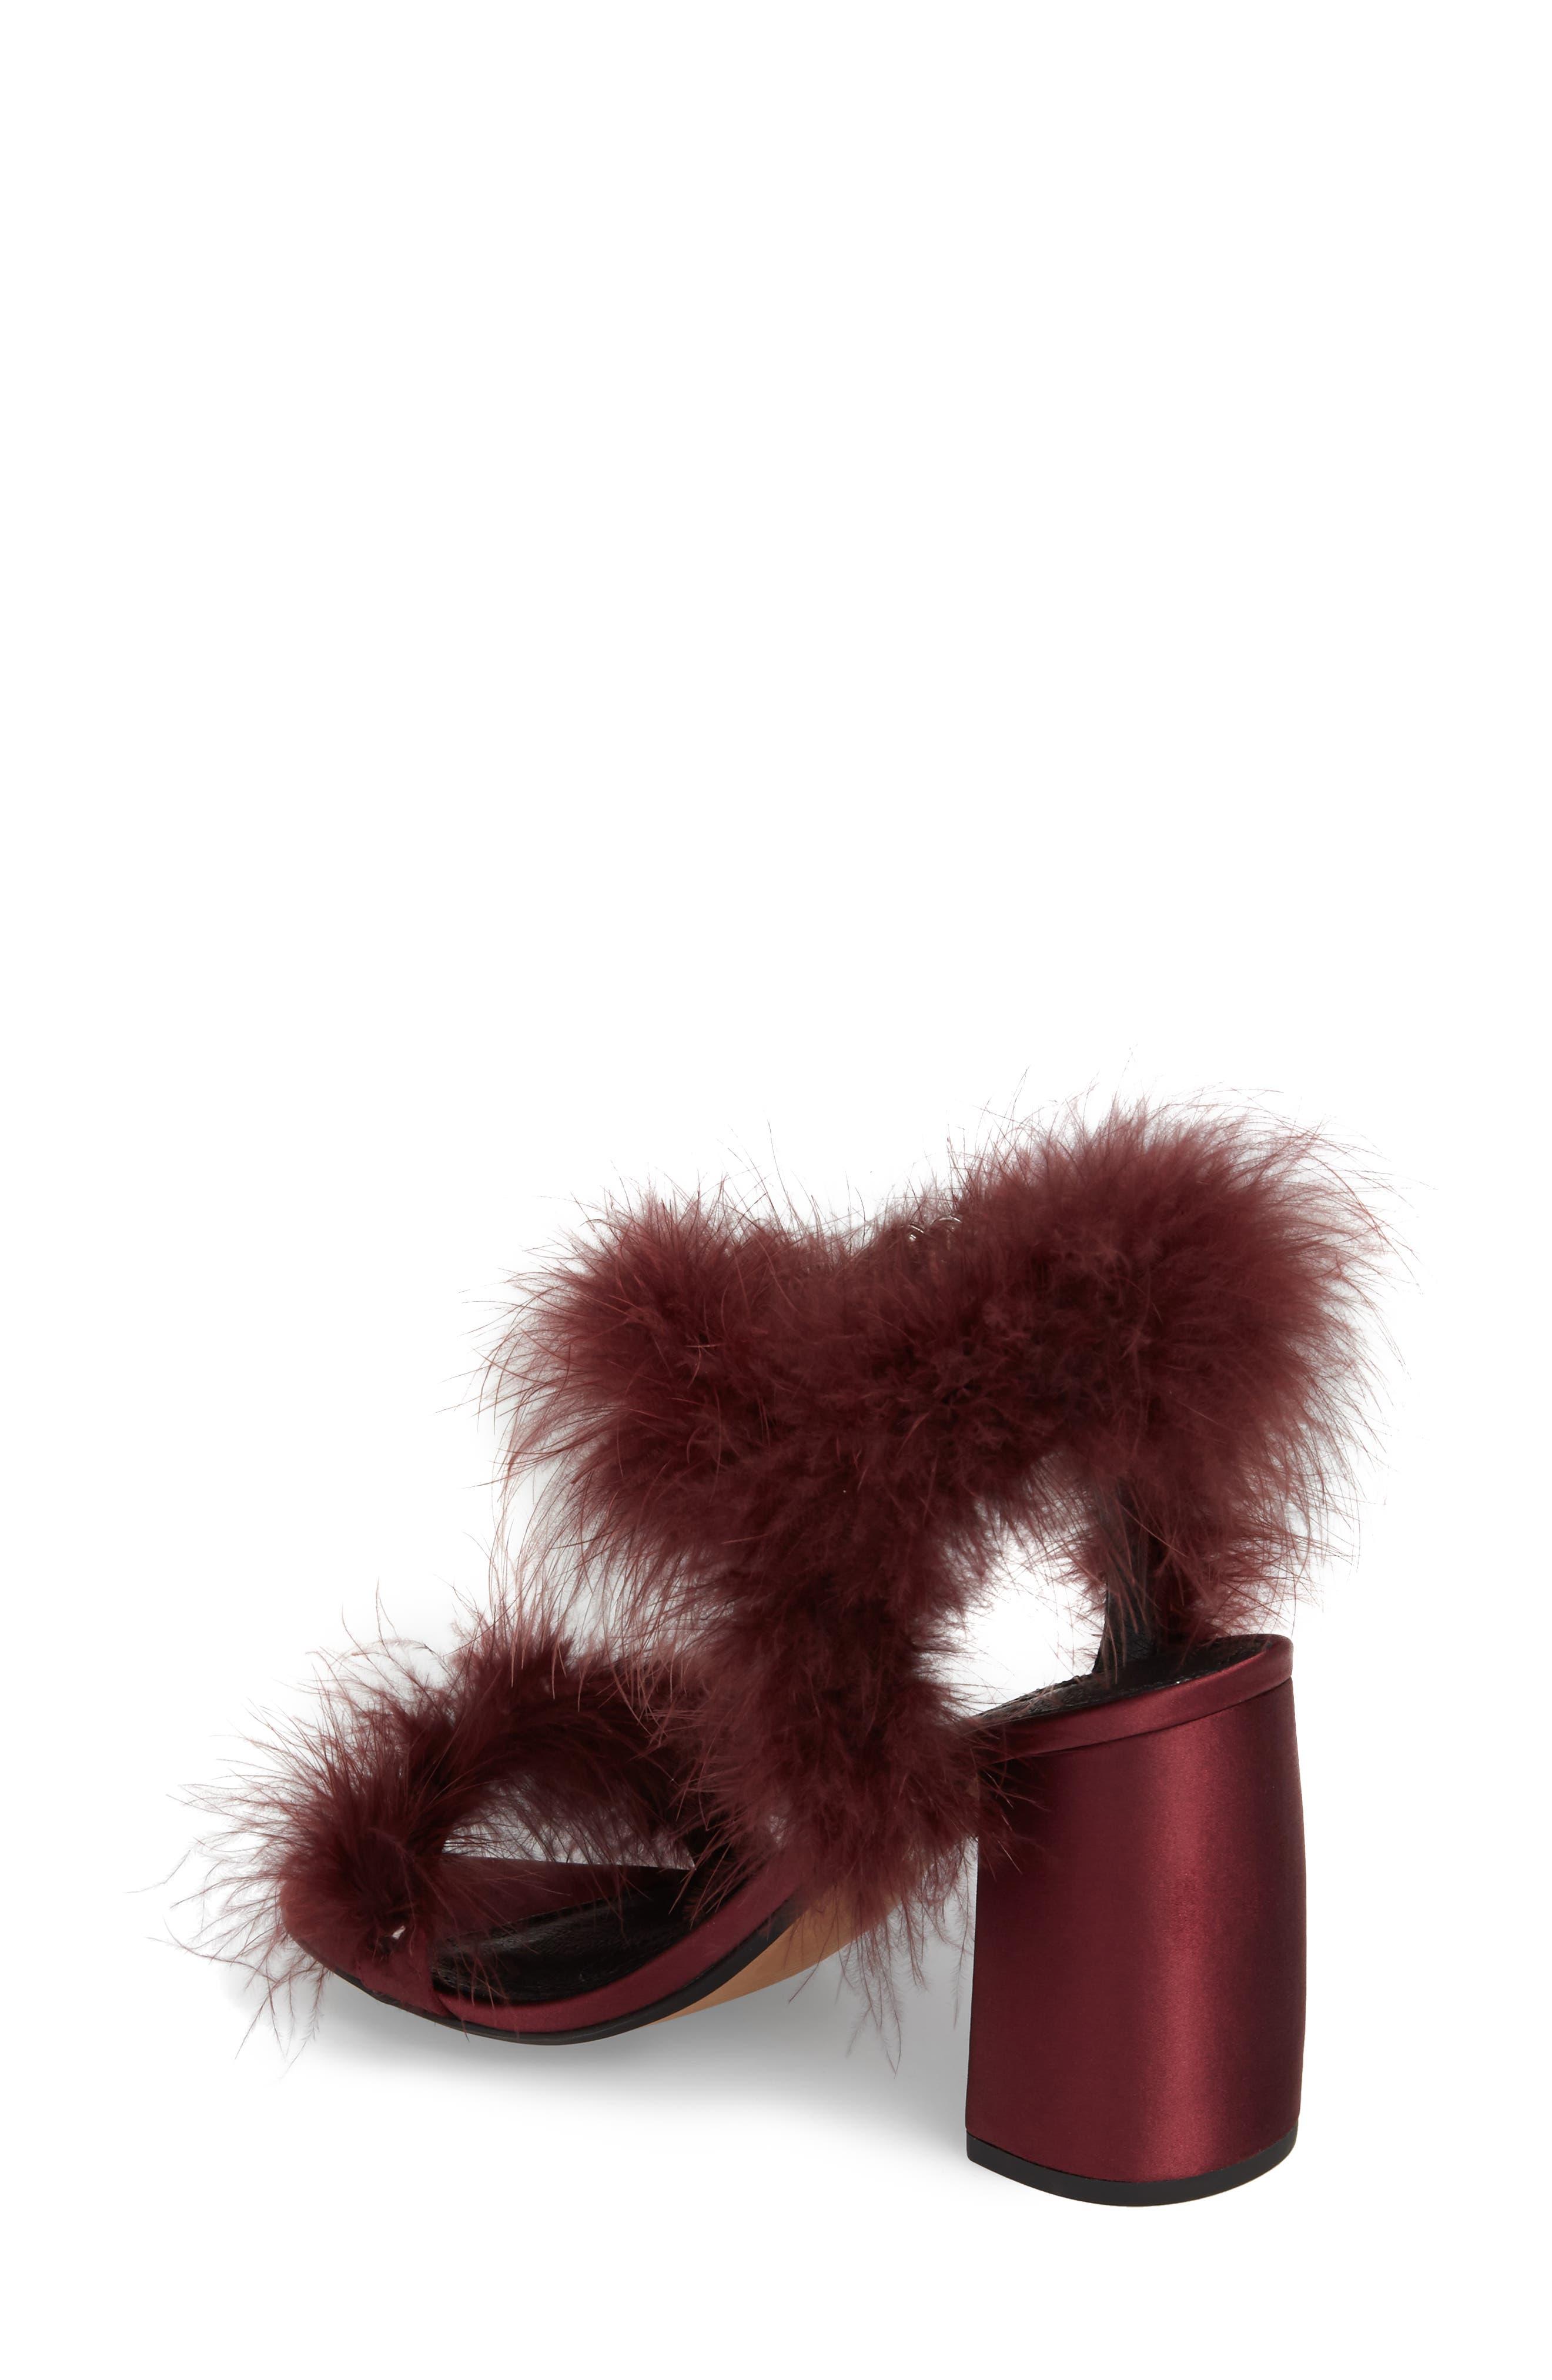 Maribou Feather Sandal,                             Alternate thumbnail 2, color,                             930